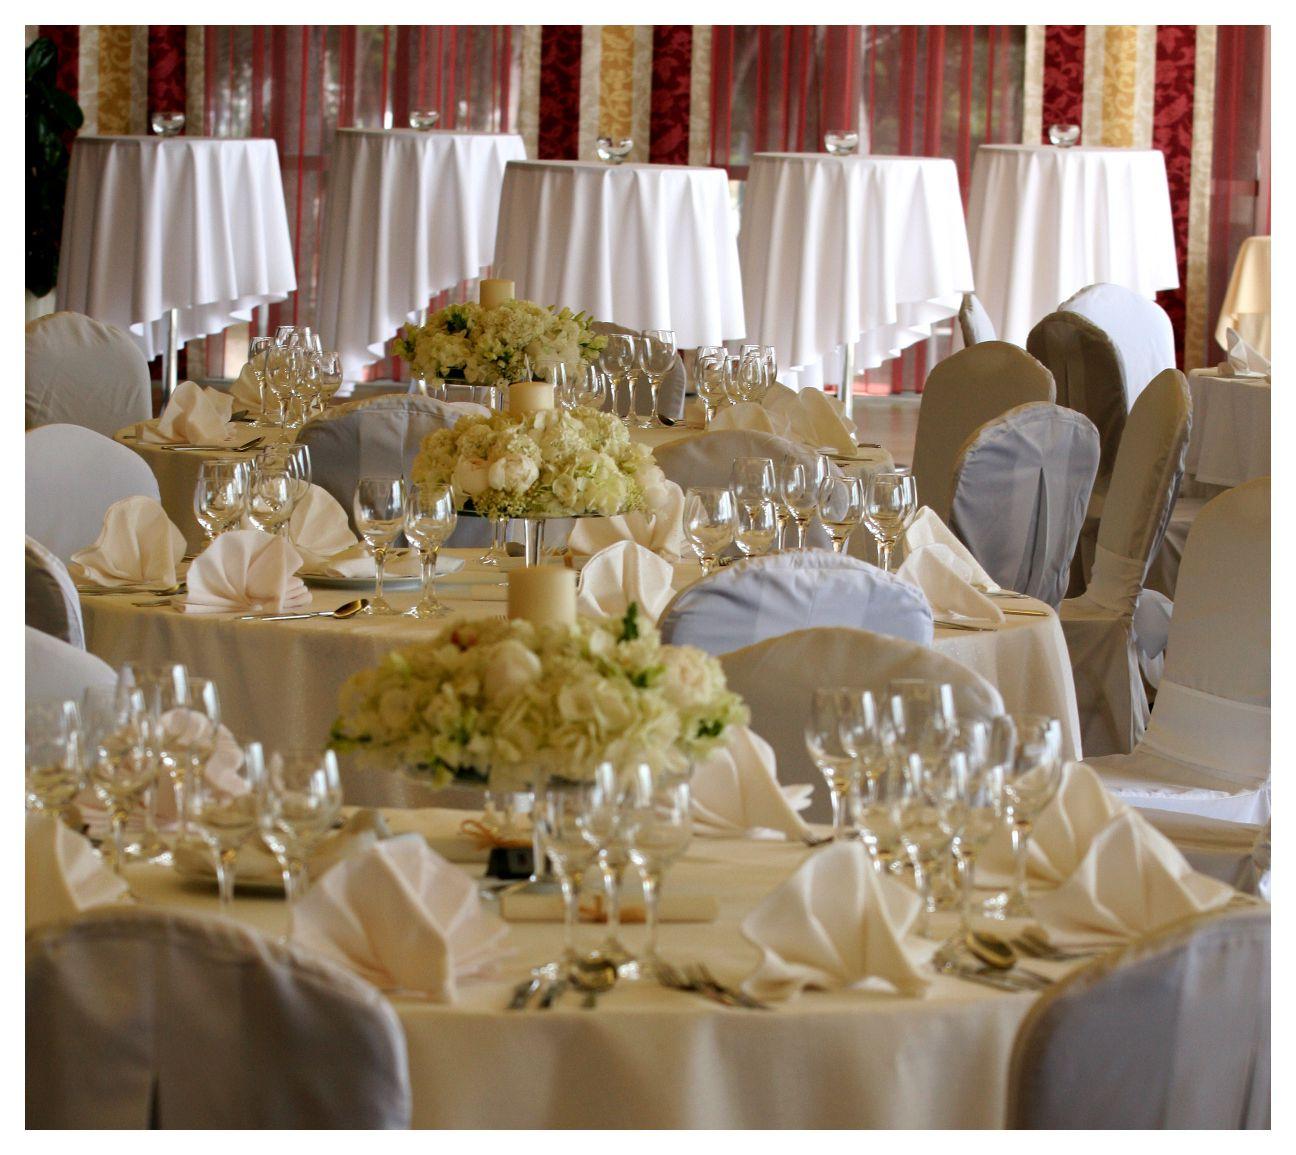 congress center gala dinner 08 14639581657 o - Zora Hotel